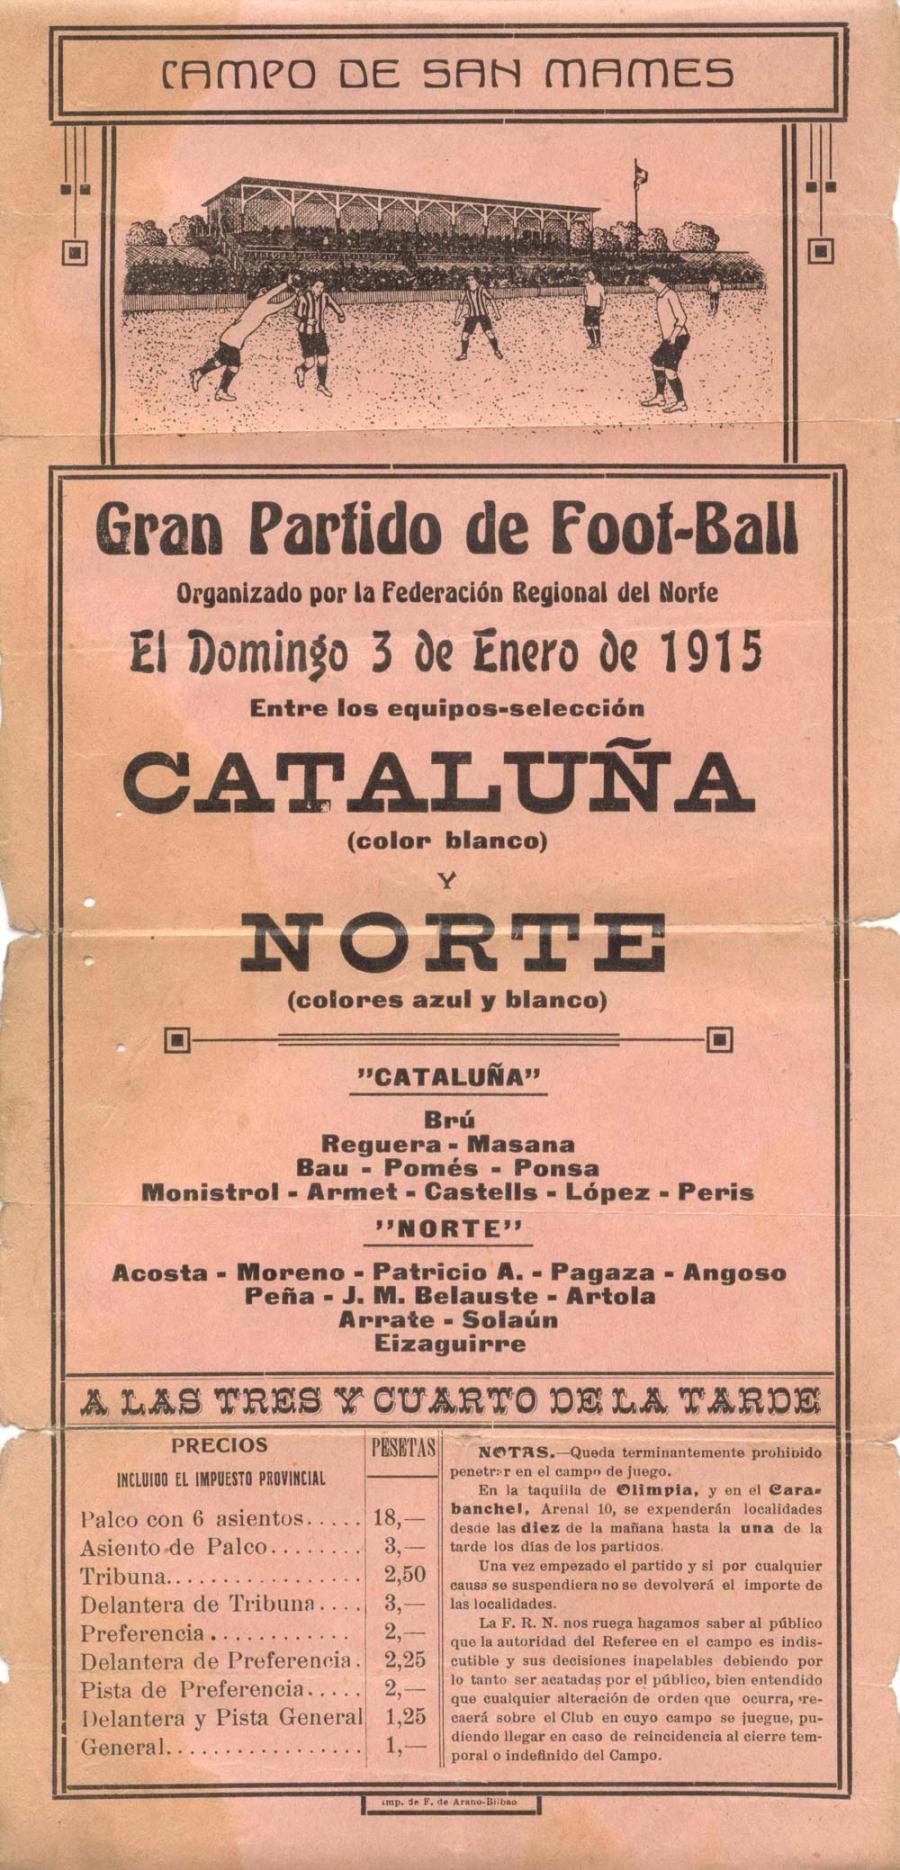 Gabriel Bau cartell San Mamés